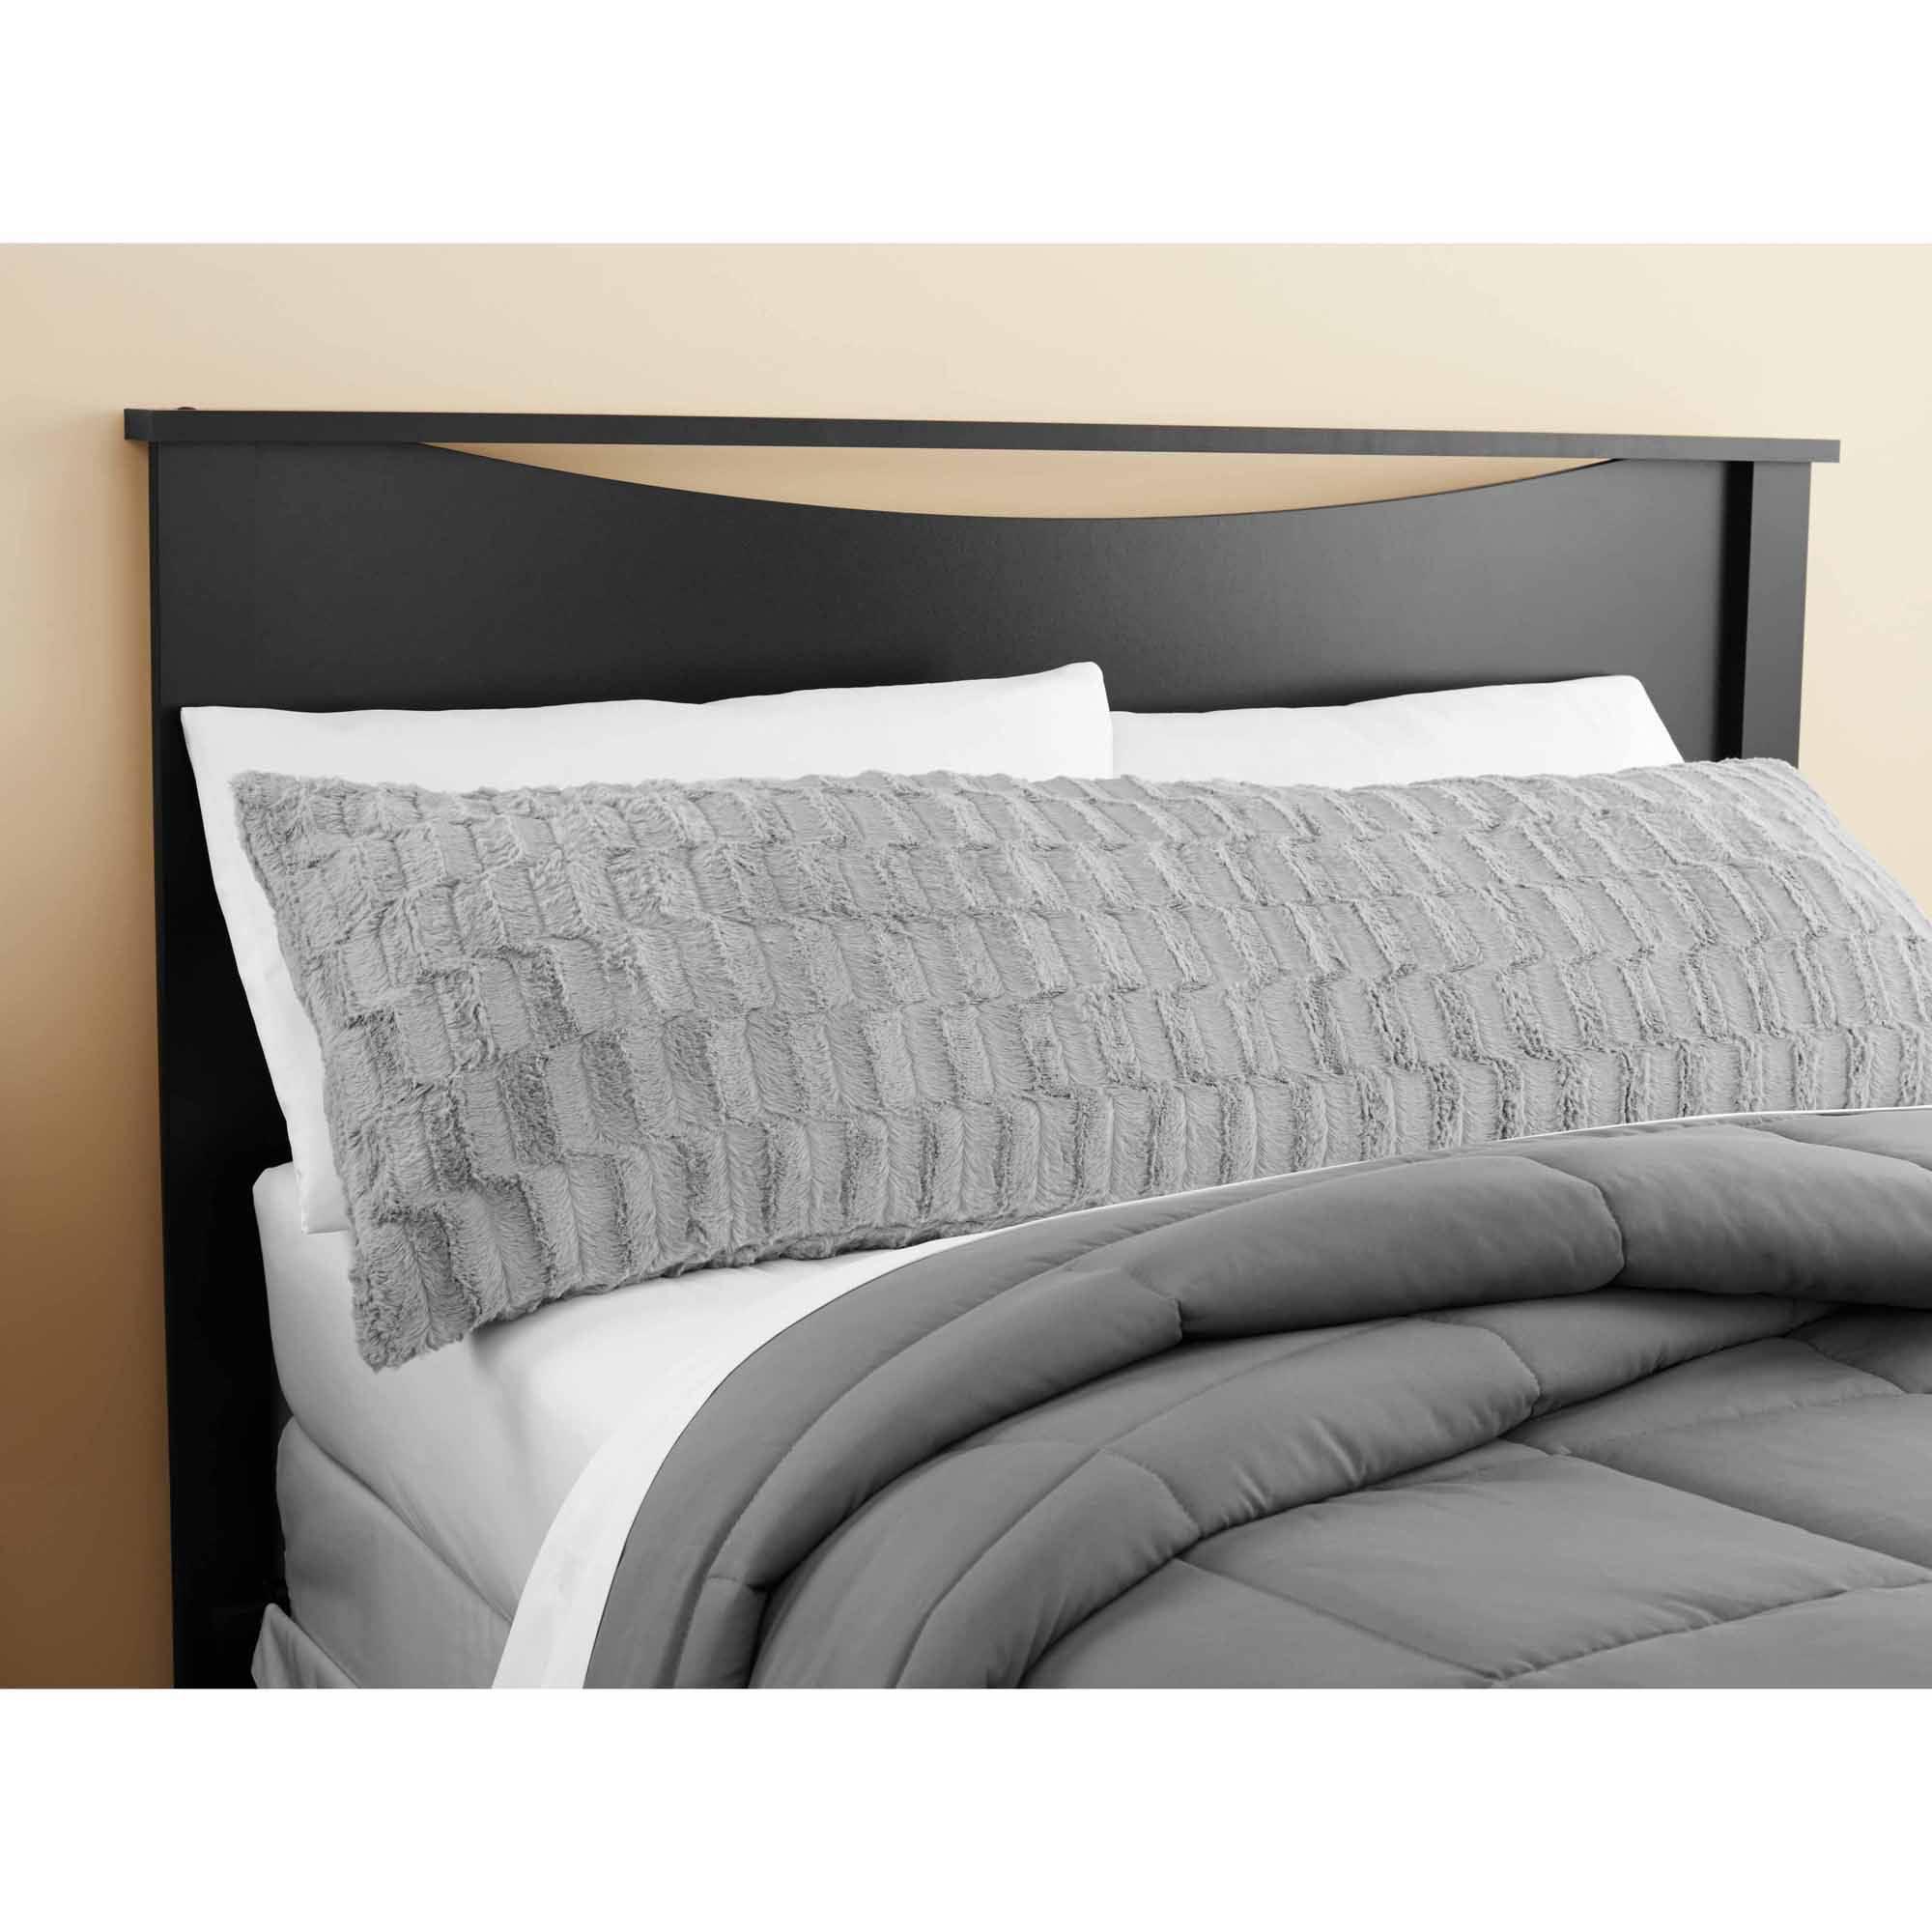 Mainstays Solid Grey Bamboo Fur Body Pillow Cover - Walmart.com